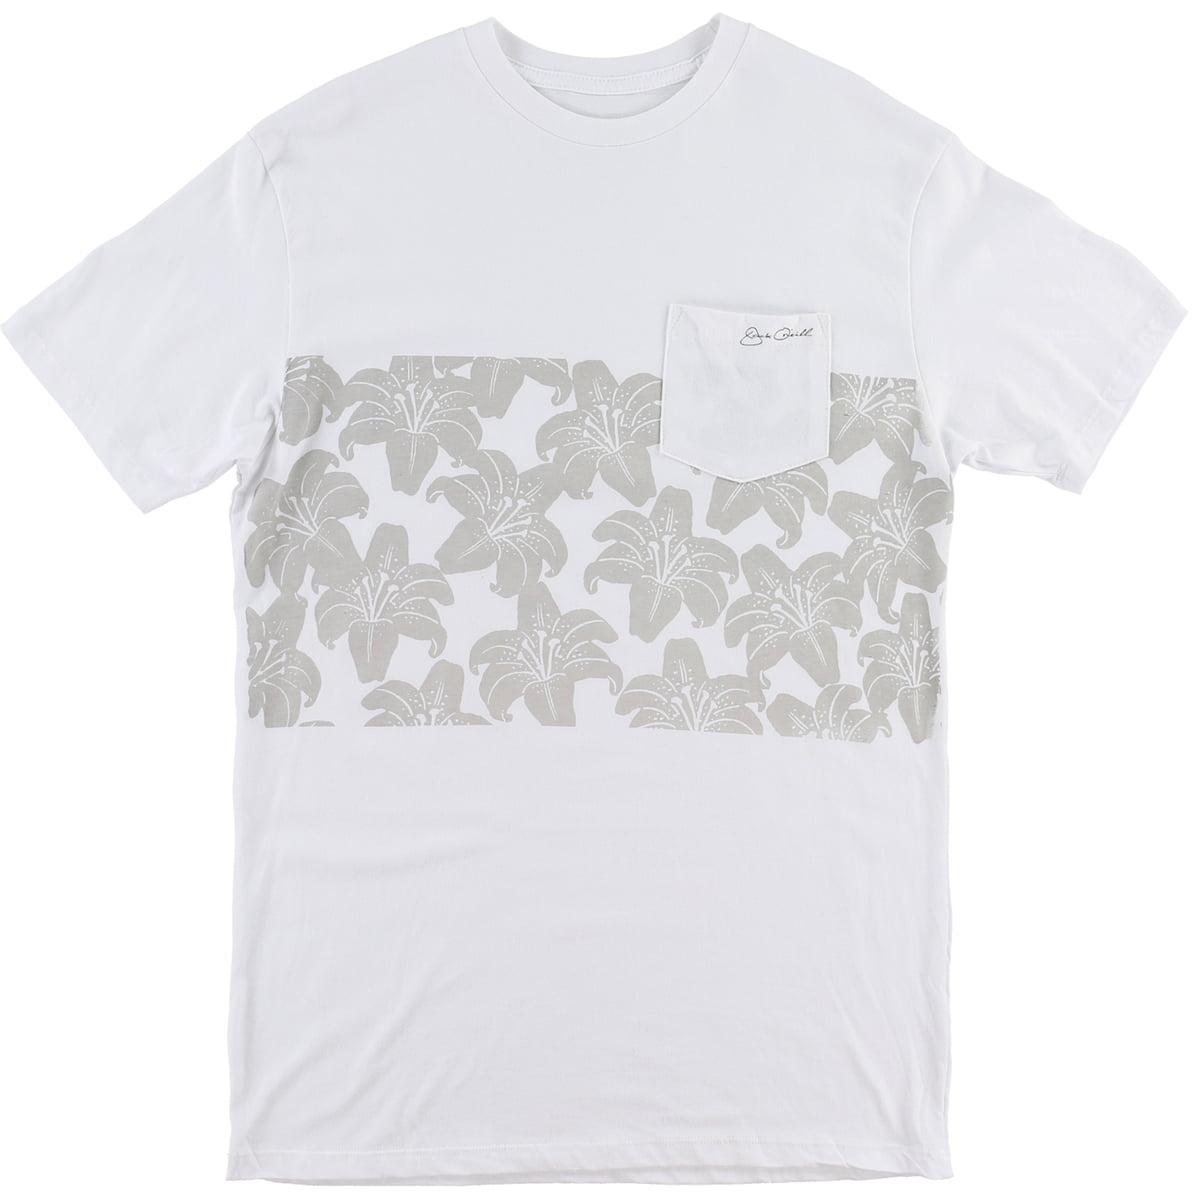 Jack O/'neill Backyard Long Sleeve T-Shirt Navy Mens Small New